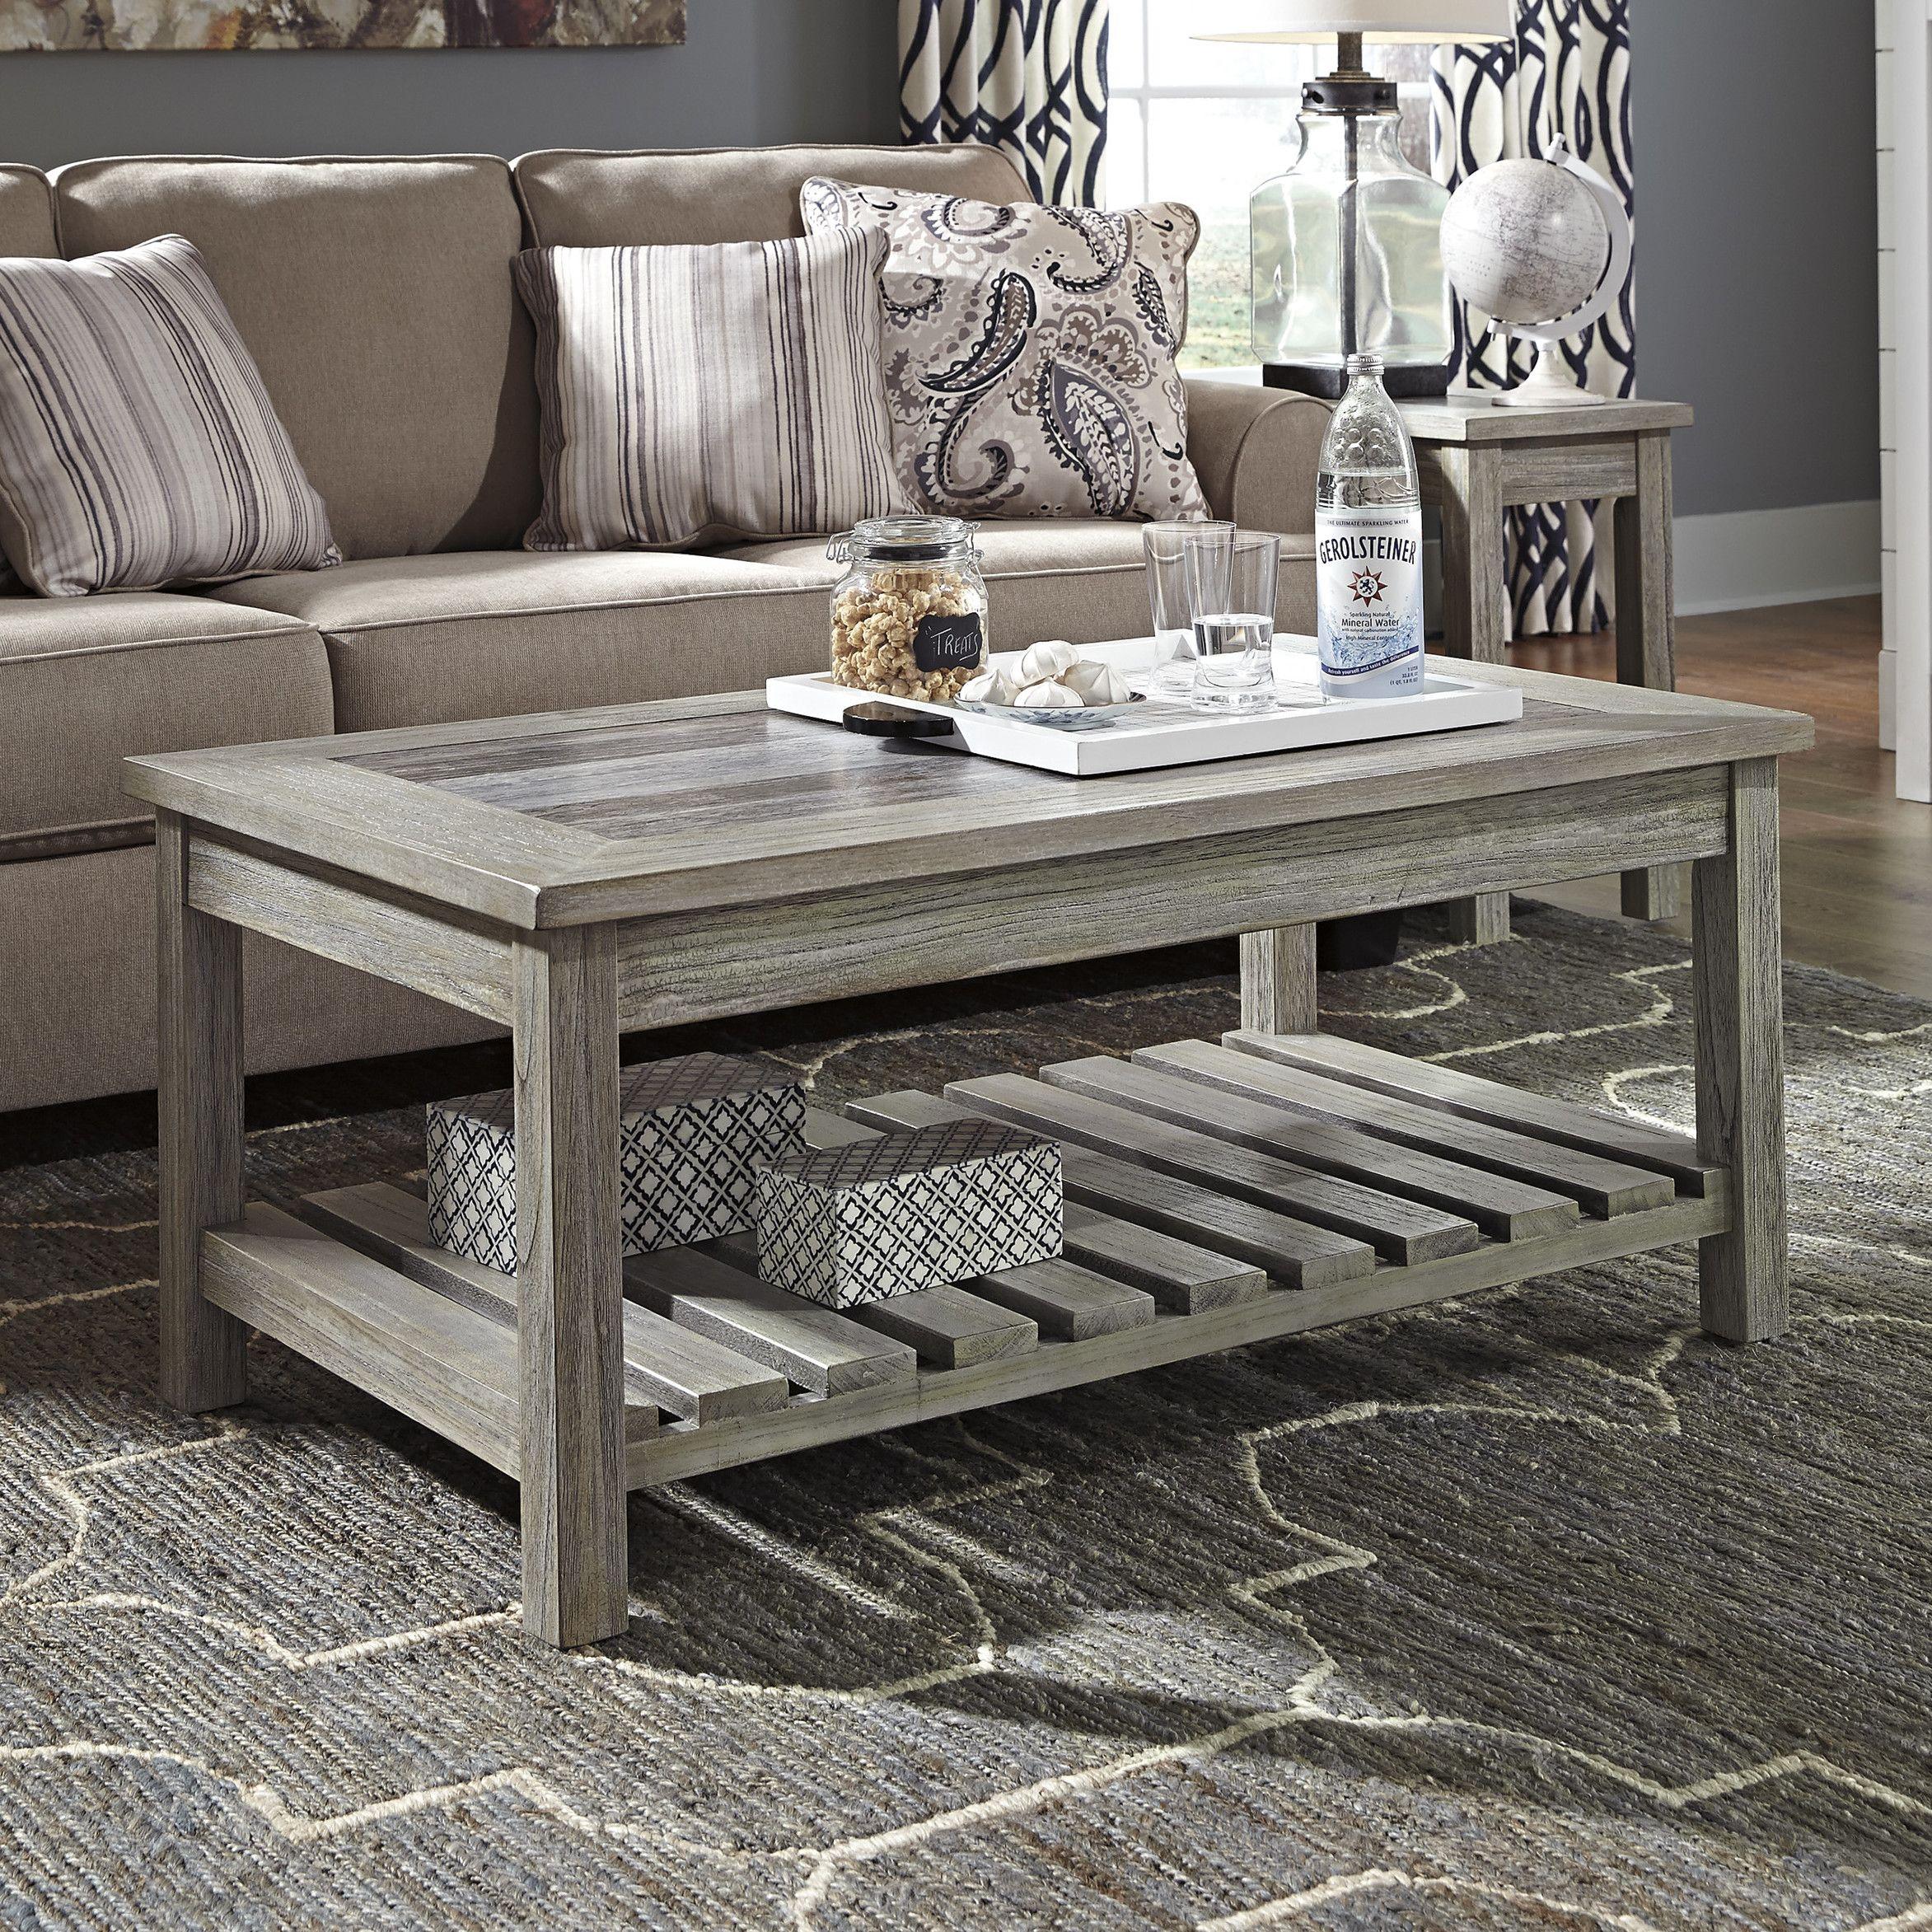 Beachcrest Home Briarwood Coffee Table with Magazine Rack | Mesas ...